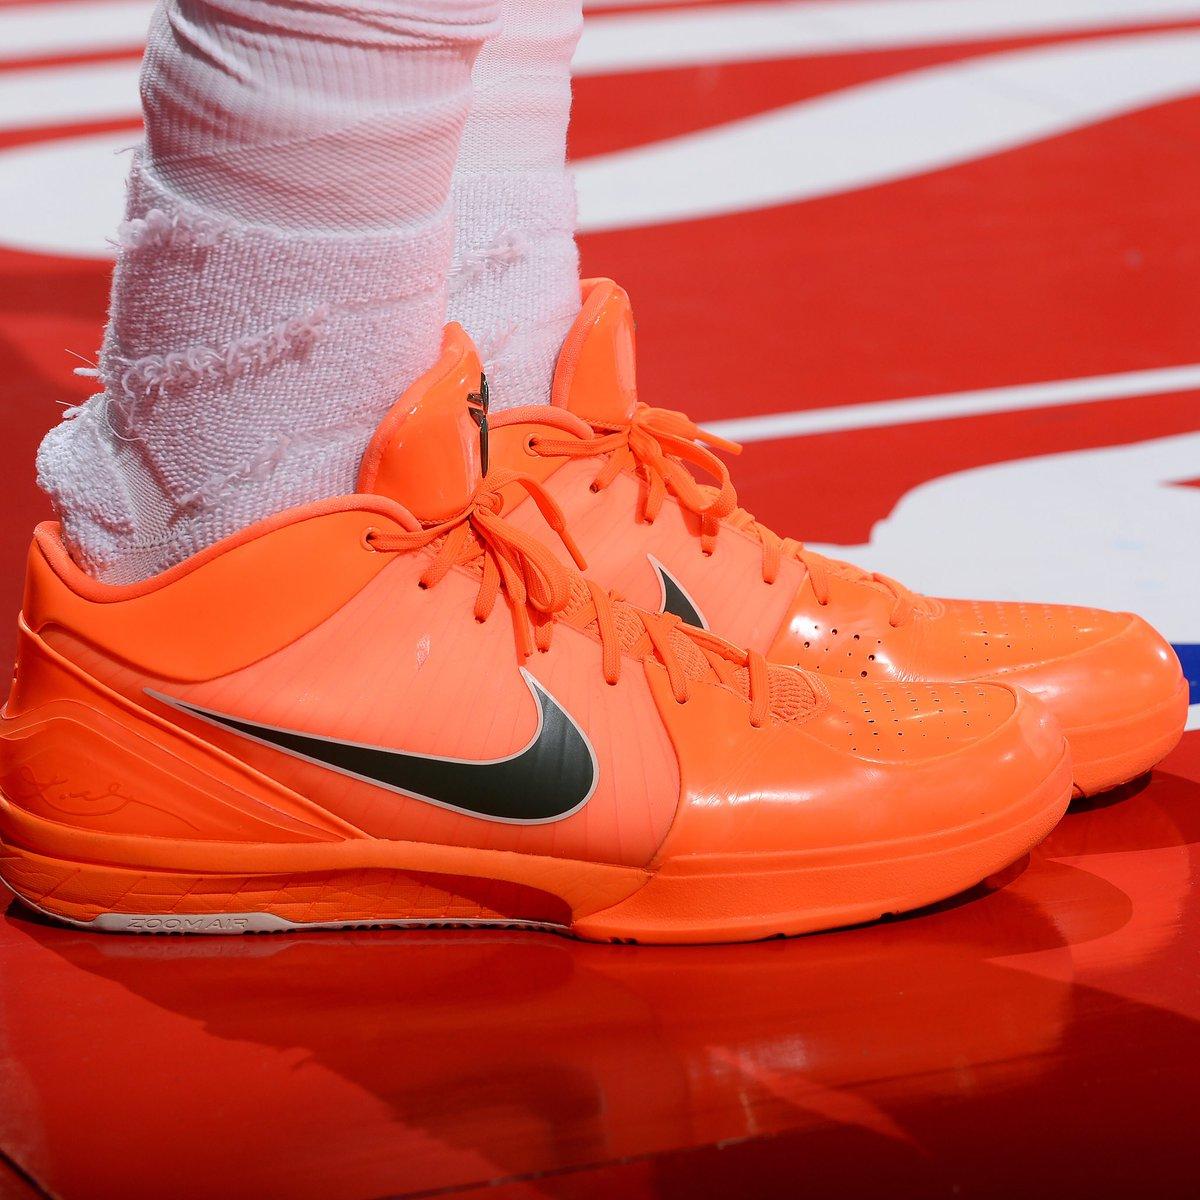 More than just OK, @Lanky_Smoove brings the 🔥 with the Nike Kobe 4 Protro in Las Vegas!   #ATT #CourtsideKicks #NBAKicks